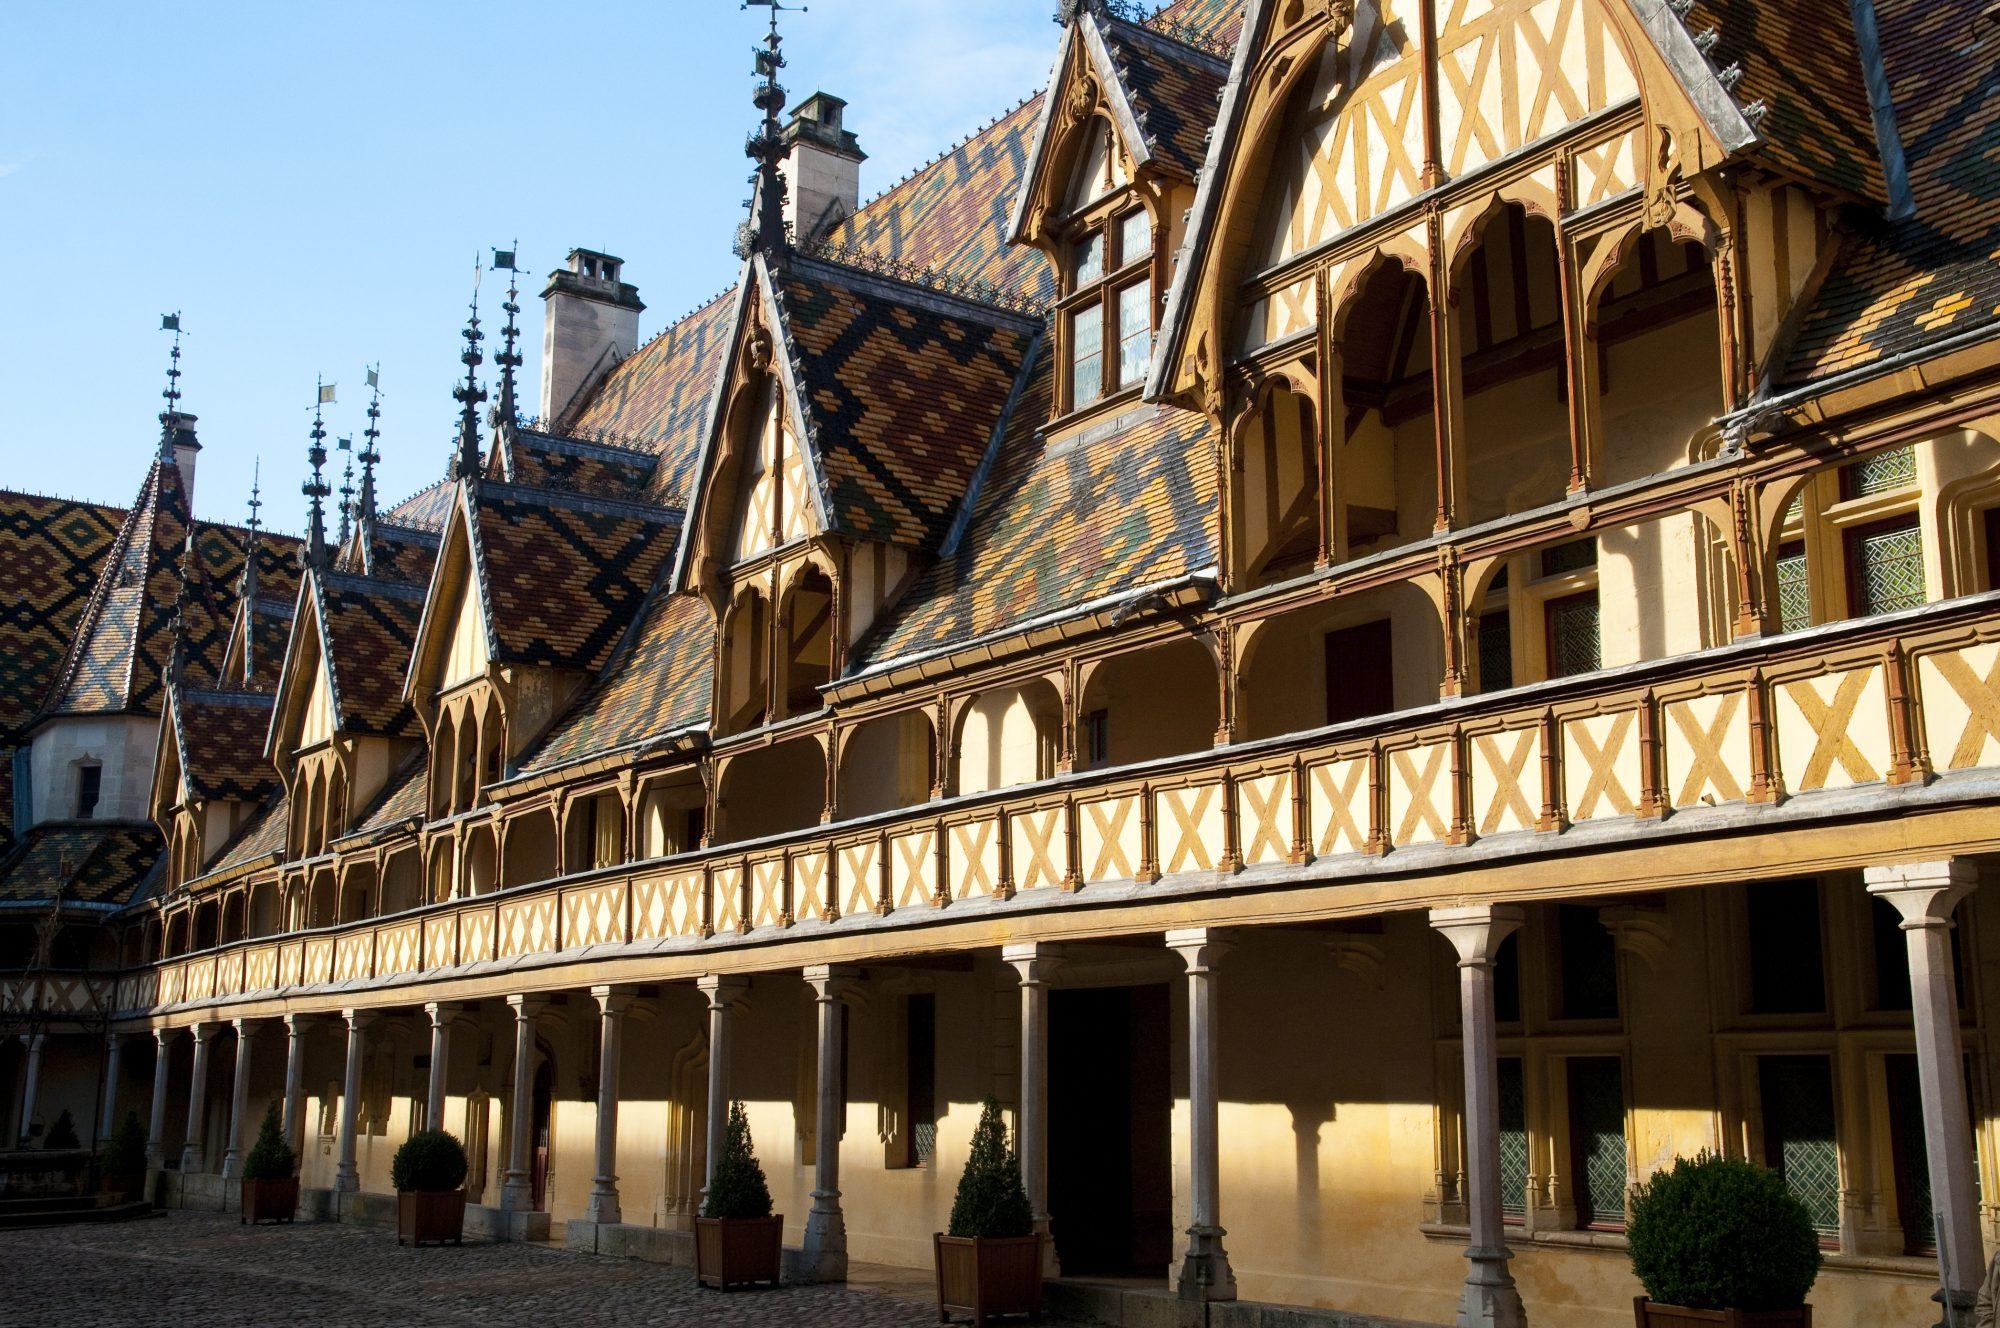 Château de Pommard Beaune Market